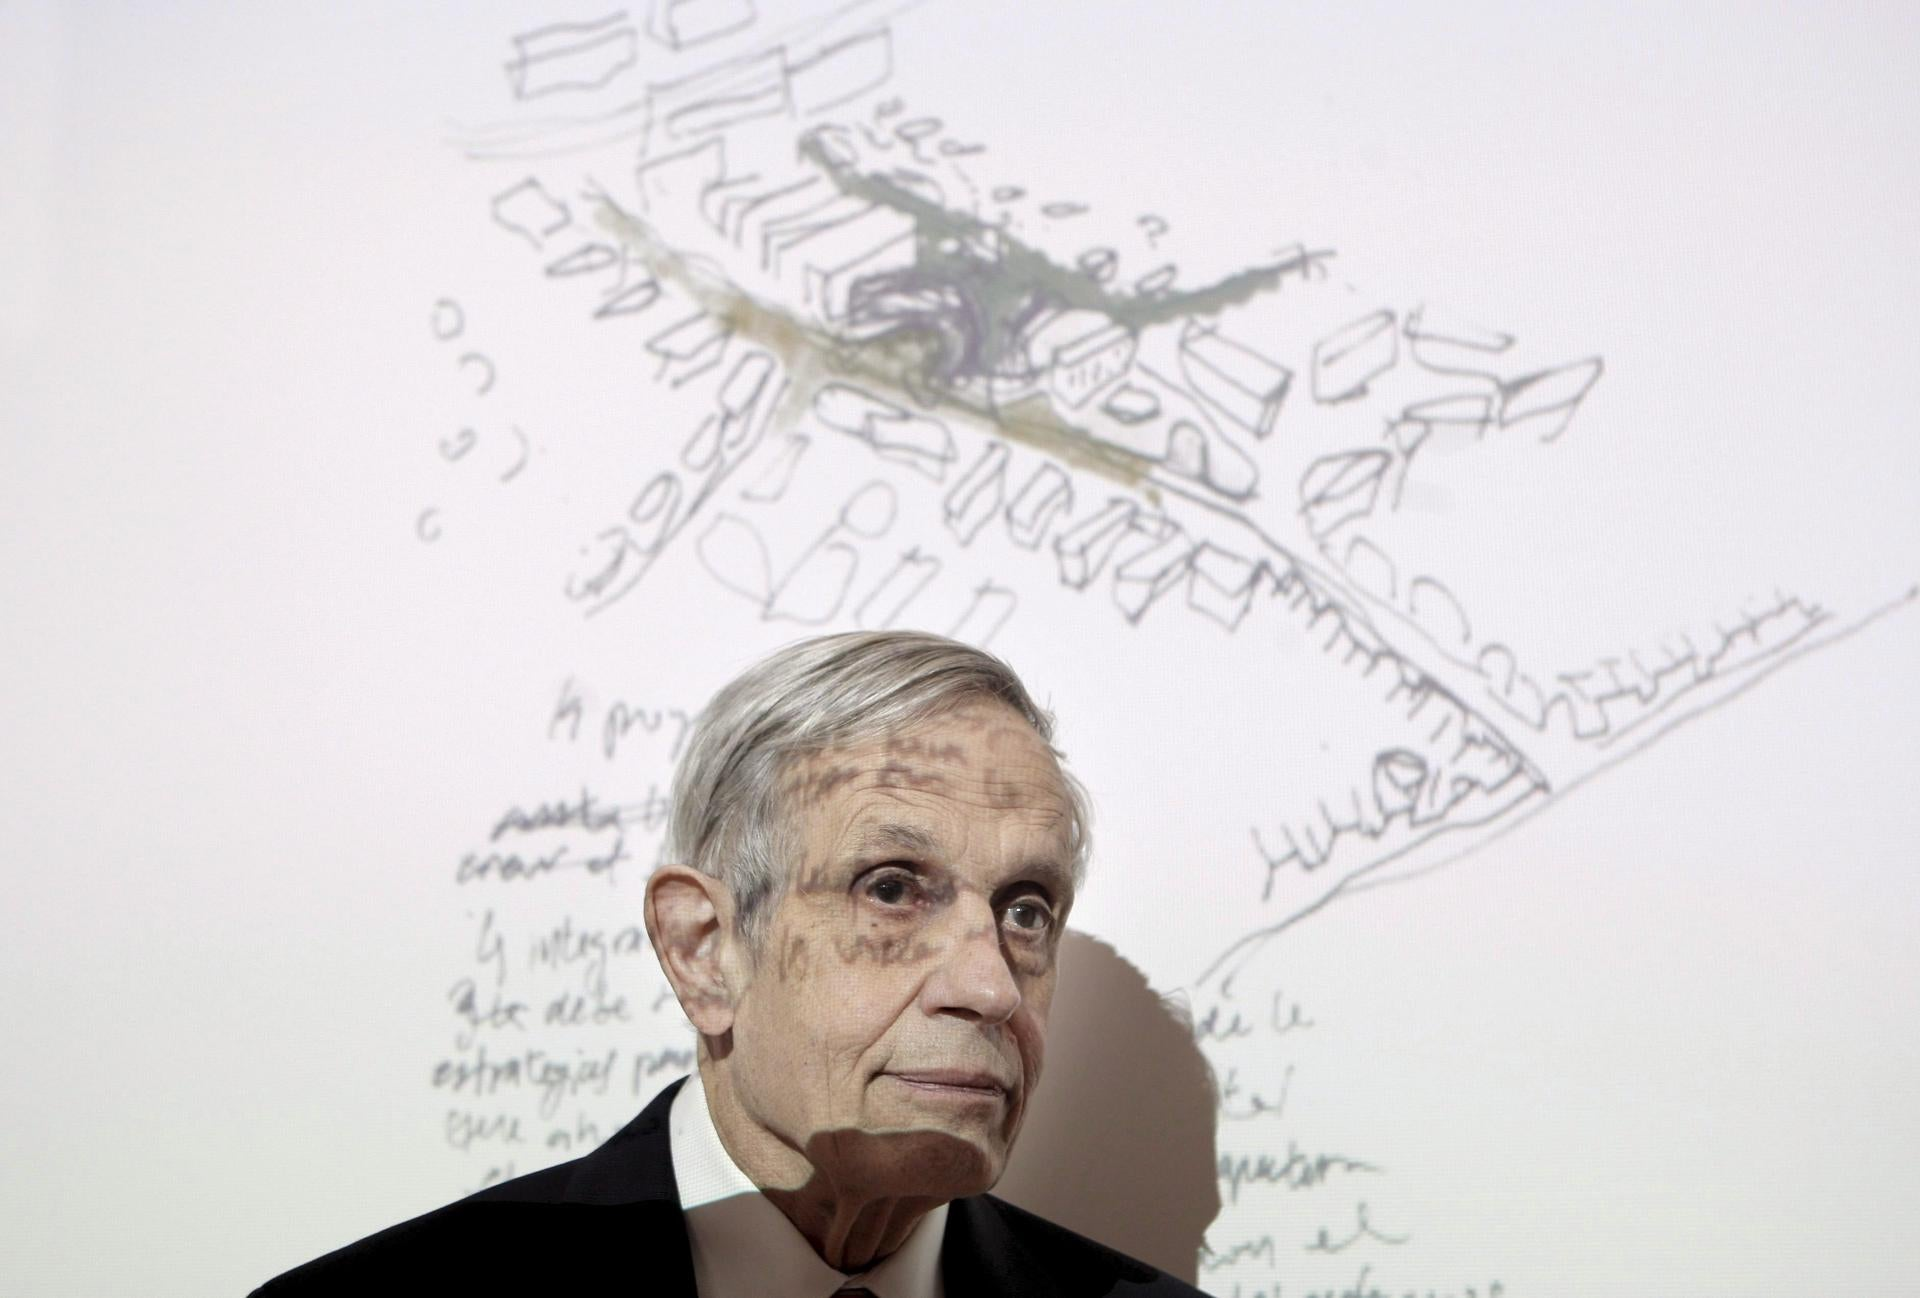 john nash winner of nobel prize in economics dies in crash the epa04765255 file a file picture dated 25 2008 of nobel laureate us